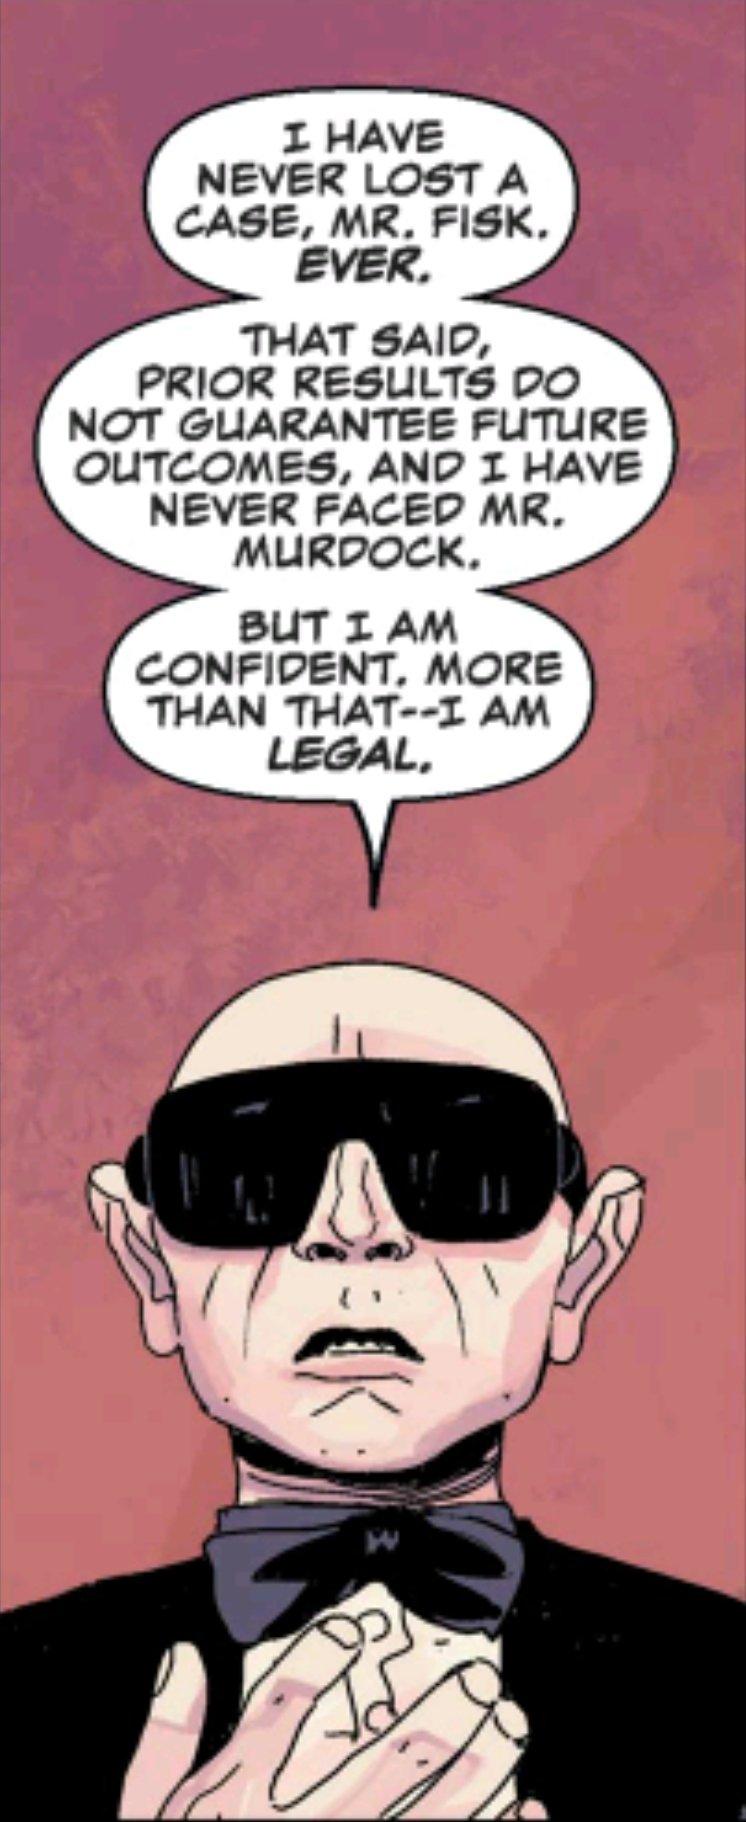 Legal, a big hot shot lawyer